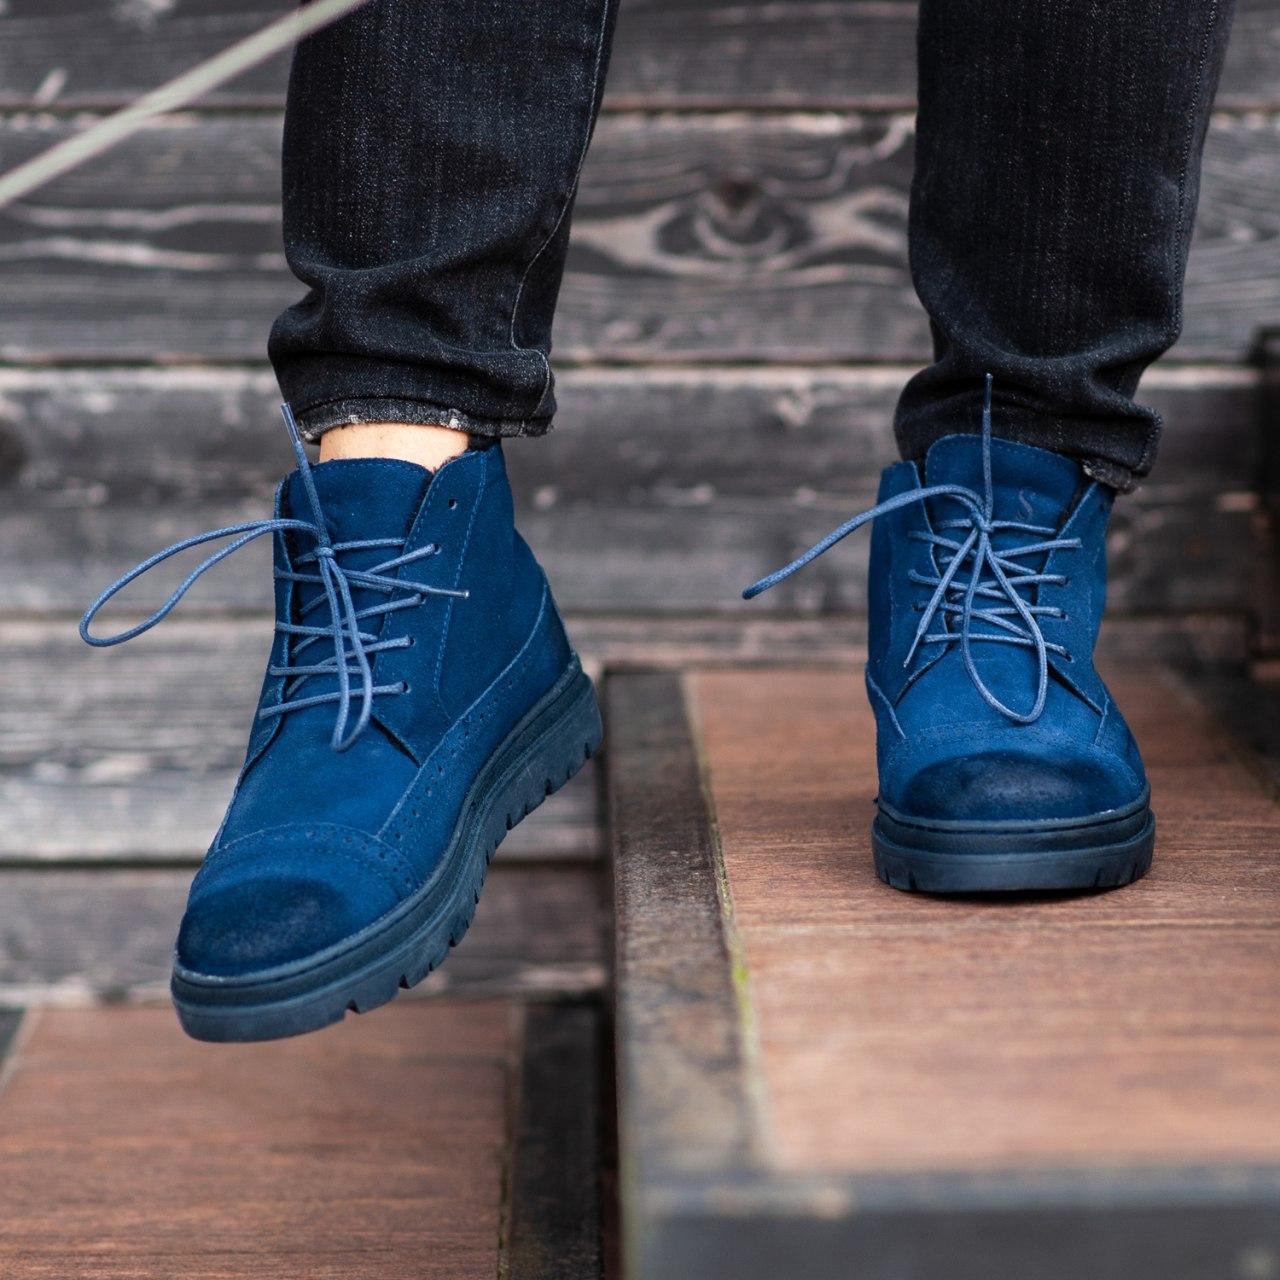 Ботинки South mist blue - фото 3